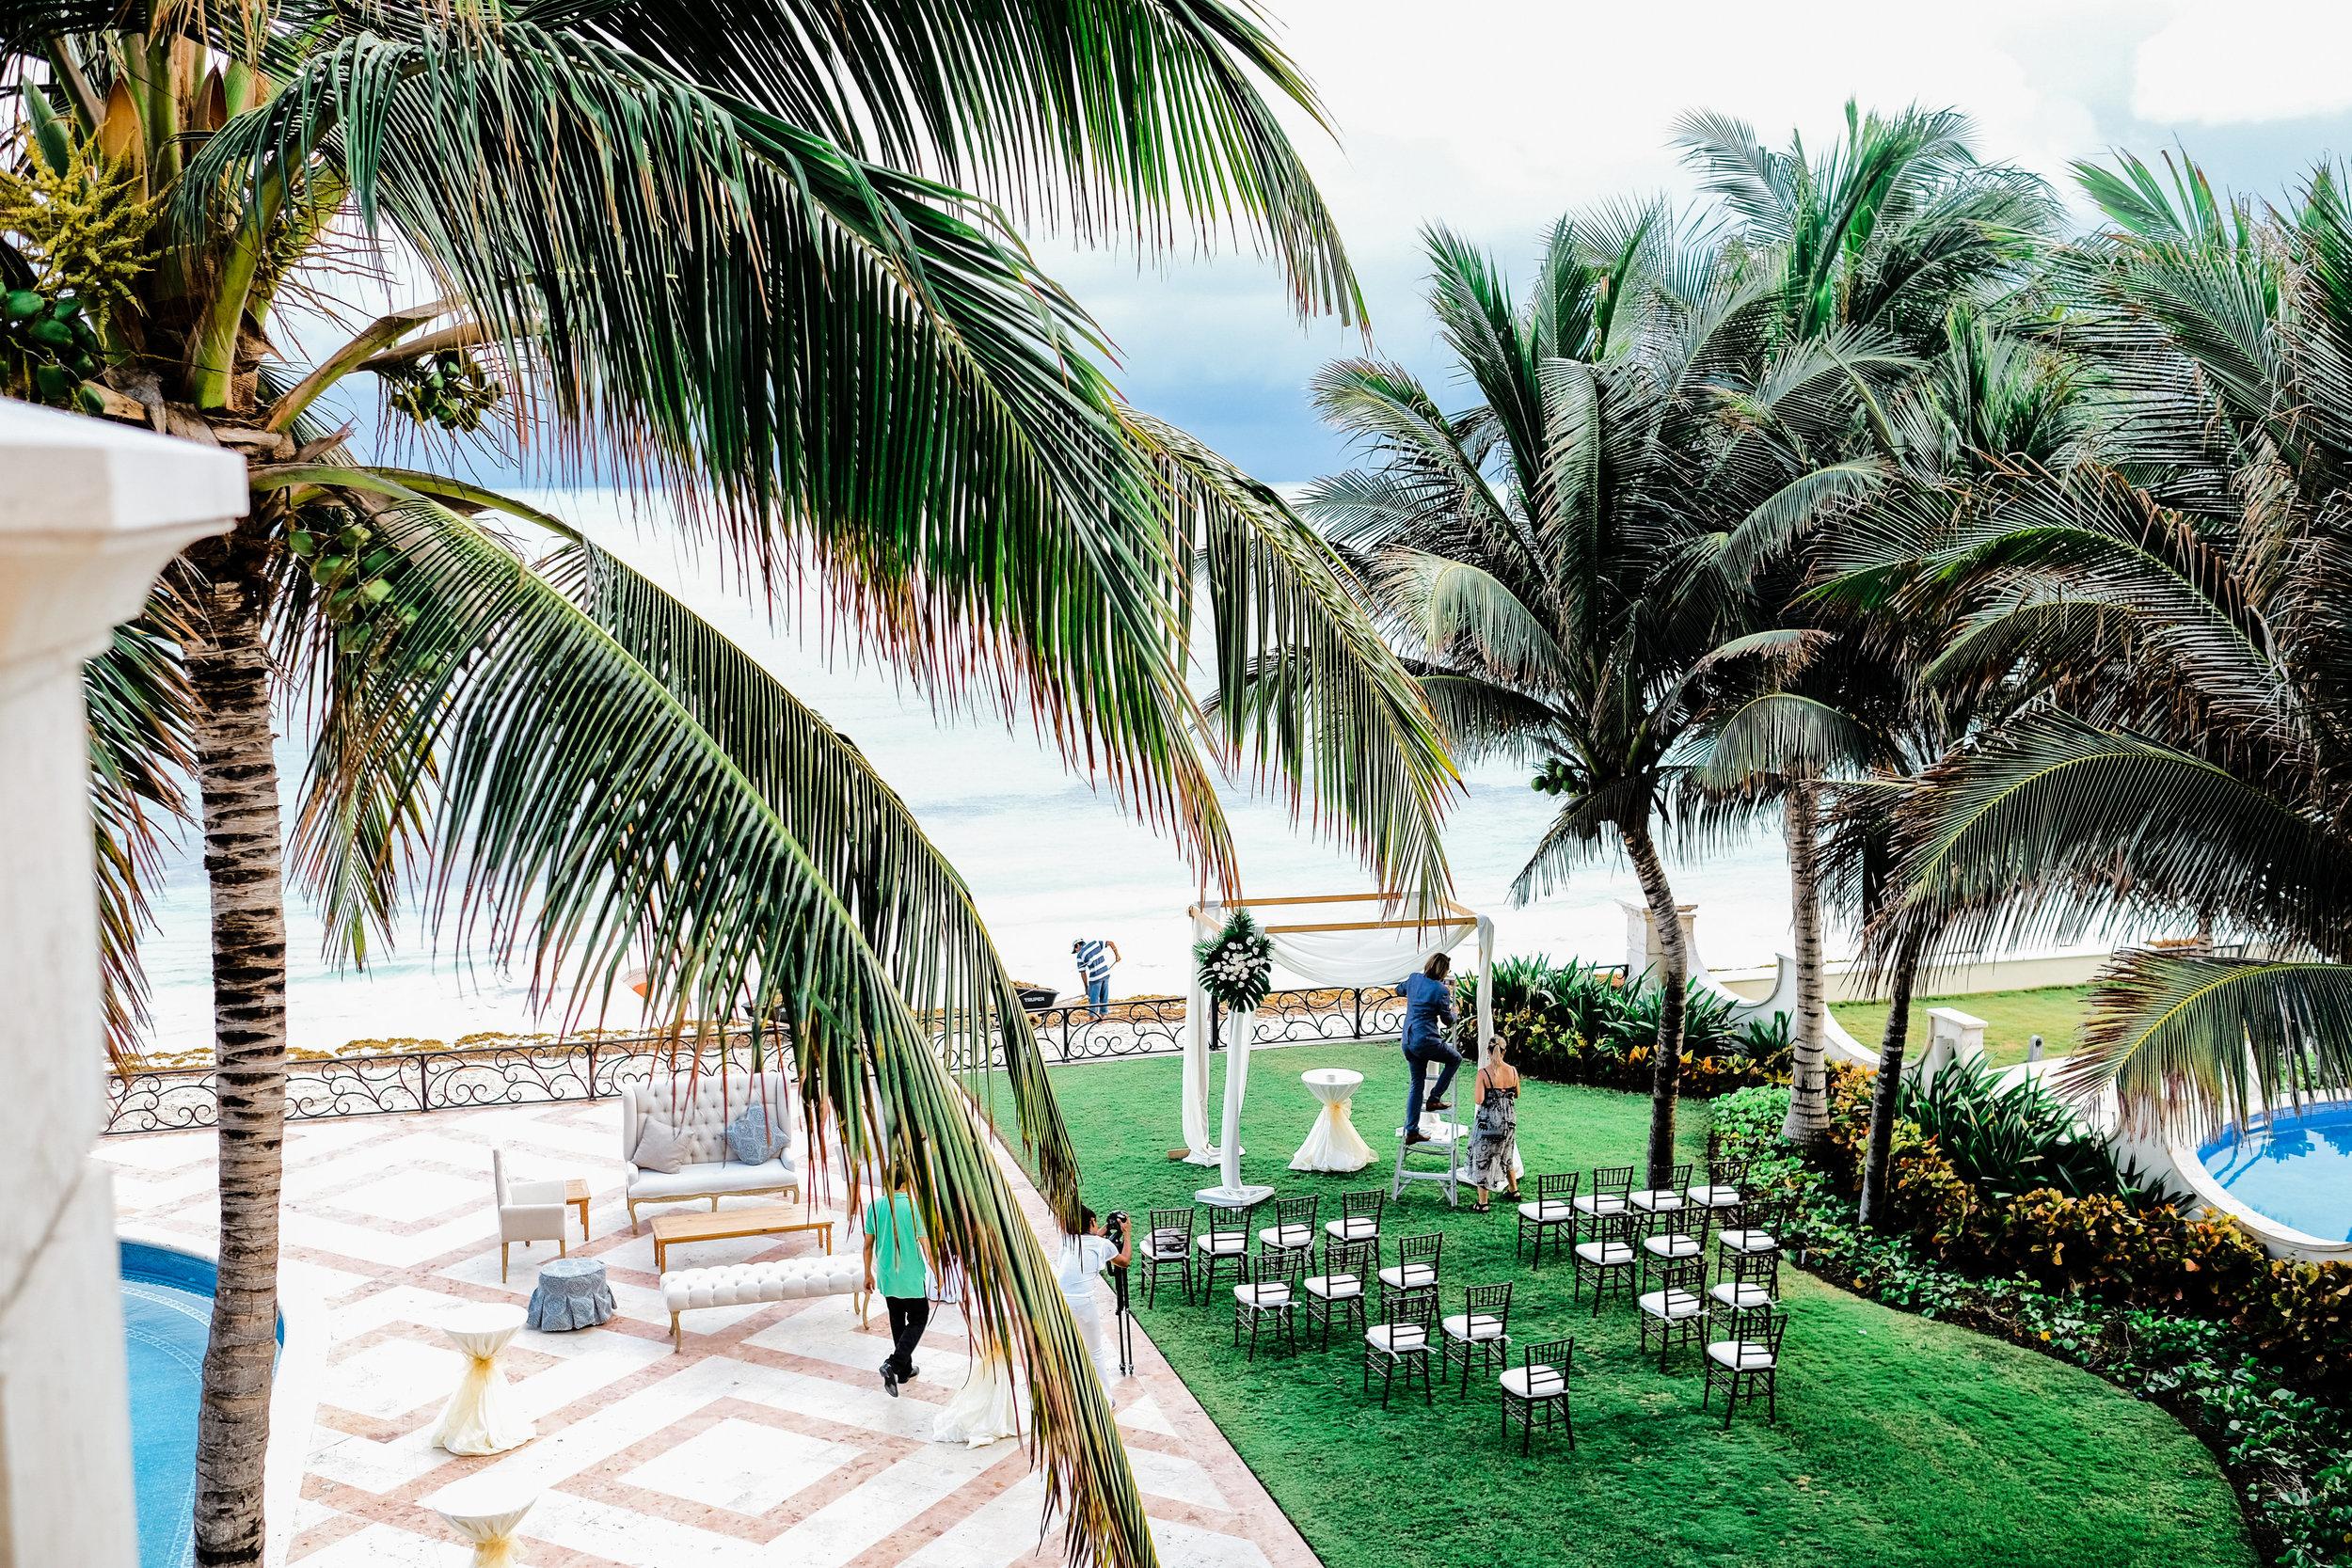 mexico_destination_wedding_villa_la_joya_cancun_44.jpg